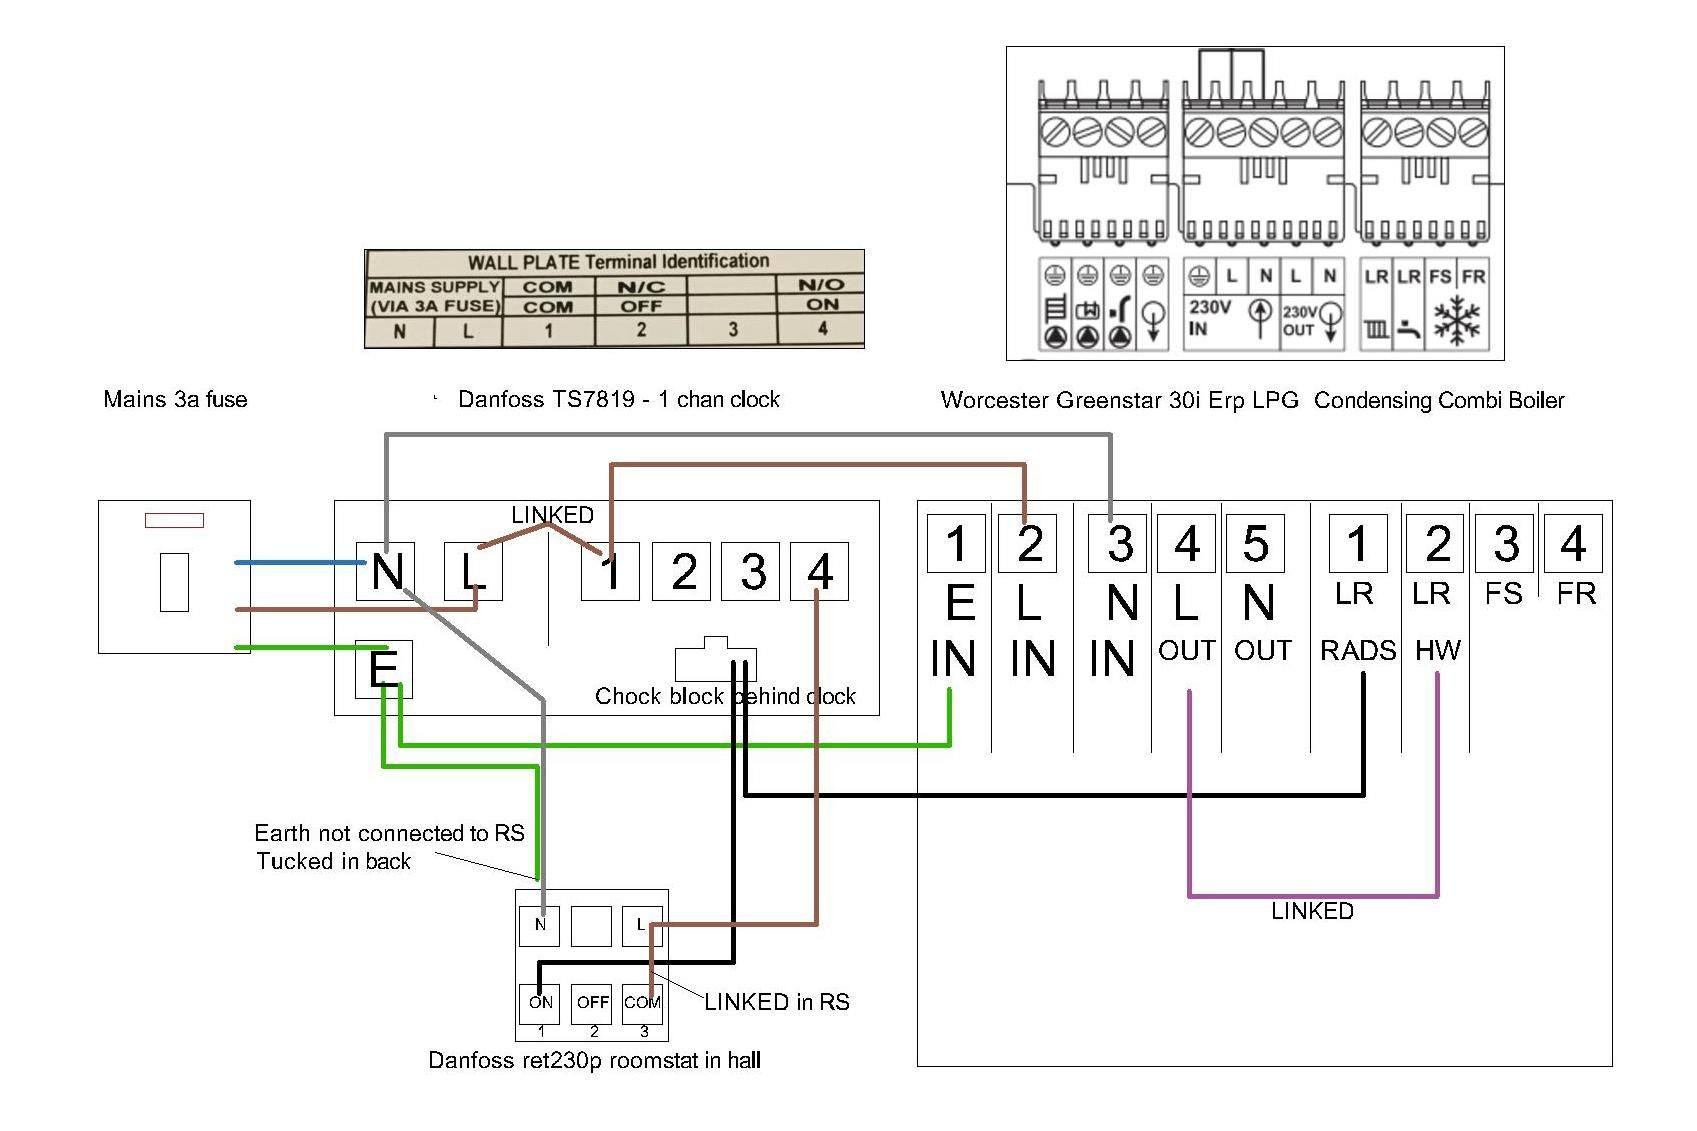 Worcester Greenstar Wiring Diagram S Video Cable Boiler Dolgular Com Best Of Bosch At Funn